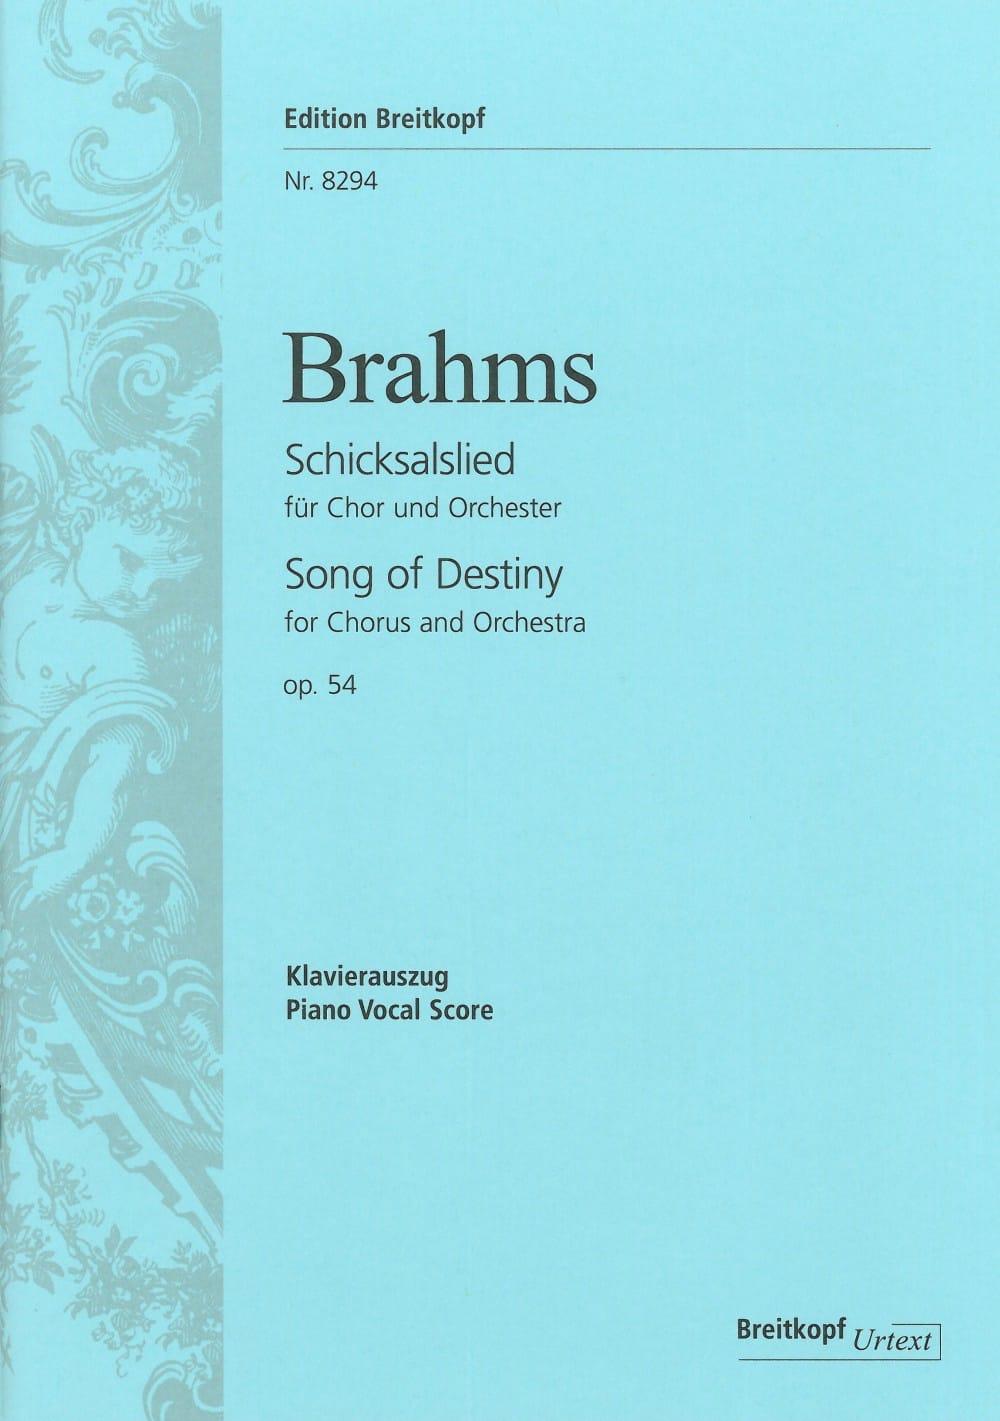 Schicksalslied Opus 54 - BRAHMS - Partition - Chœur - laflutedepan.com